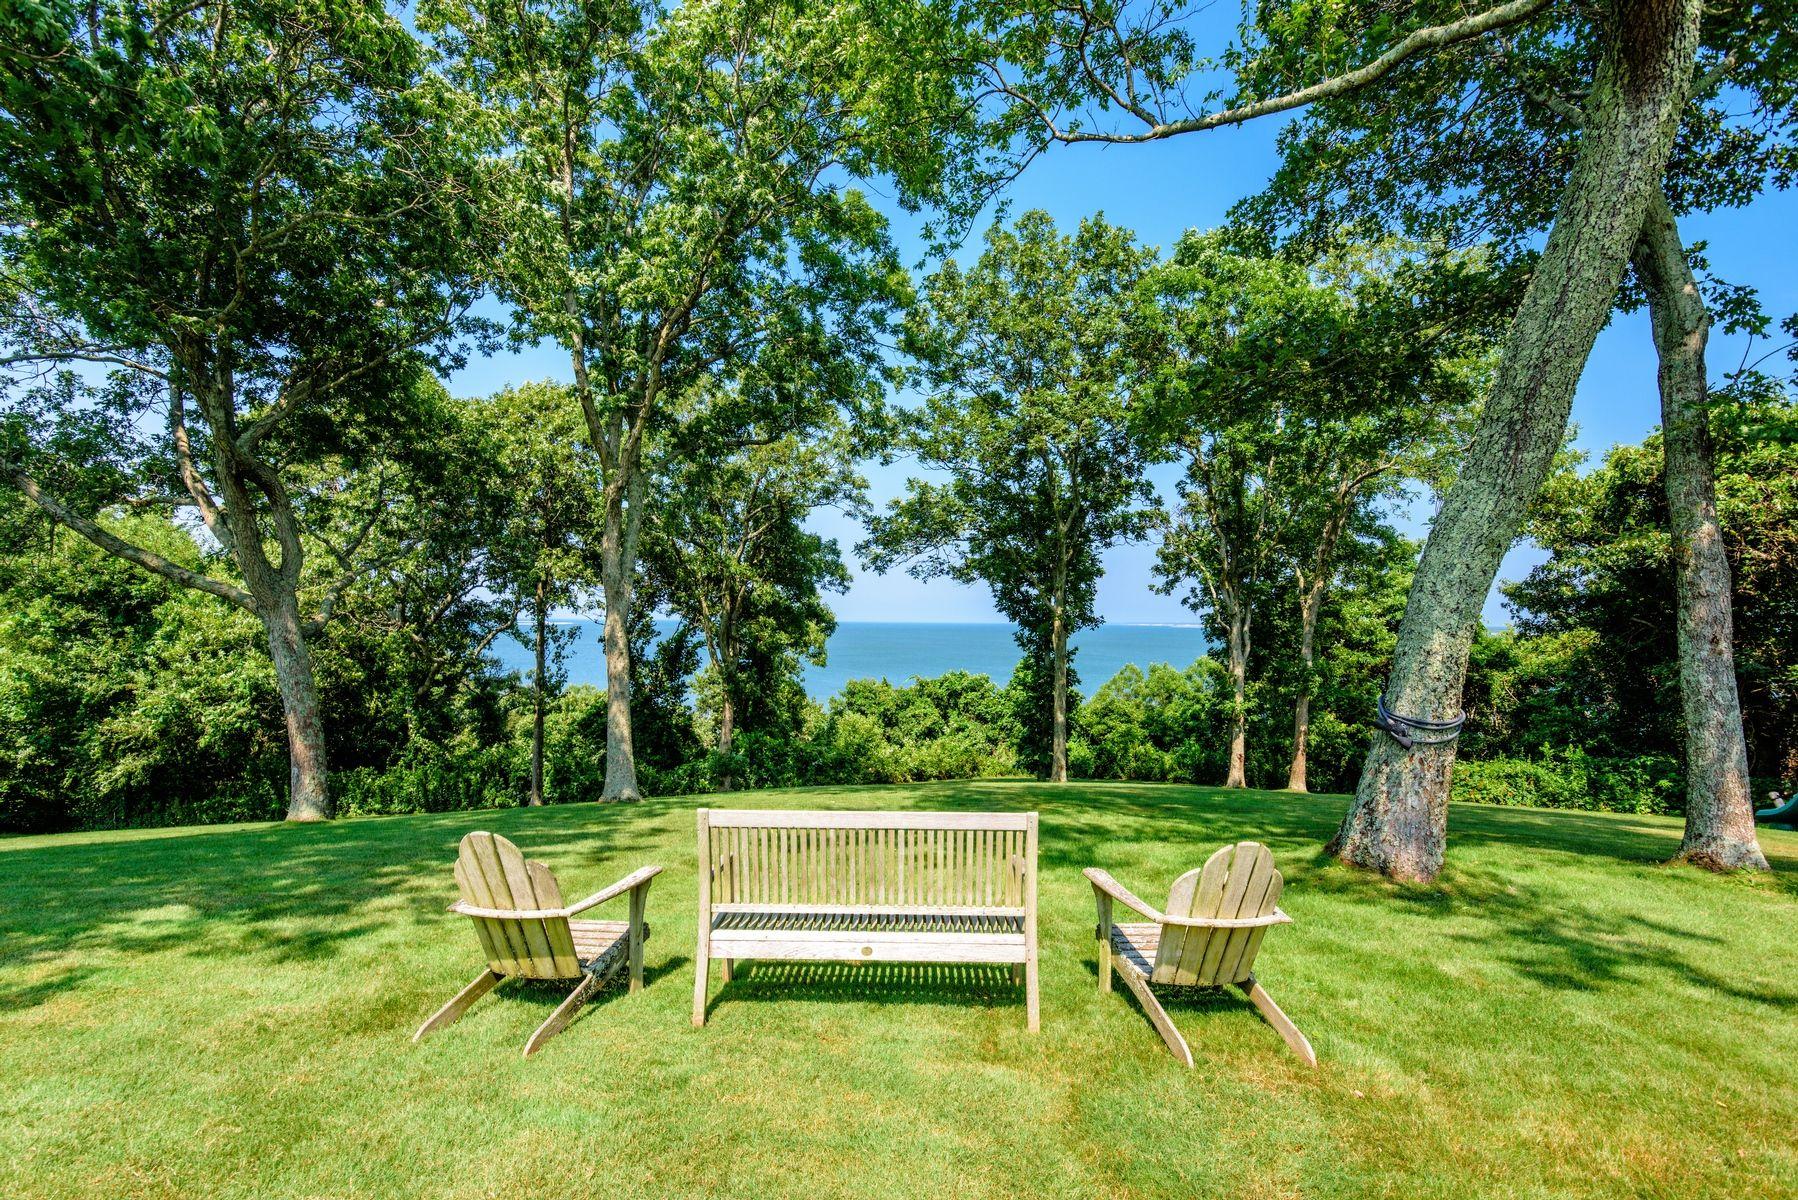 harvey weinstein lists hamptons home lawn